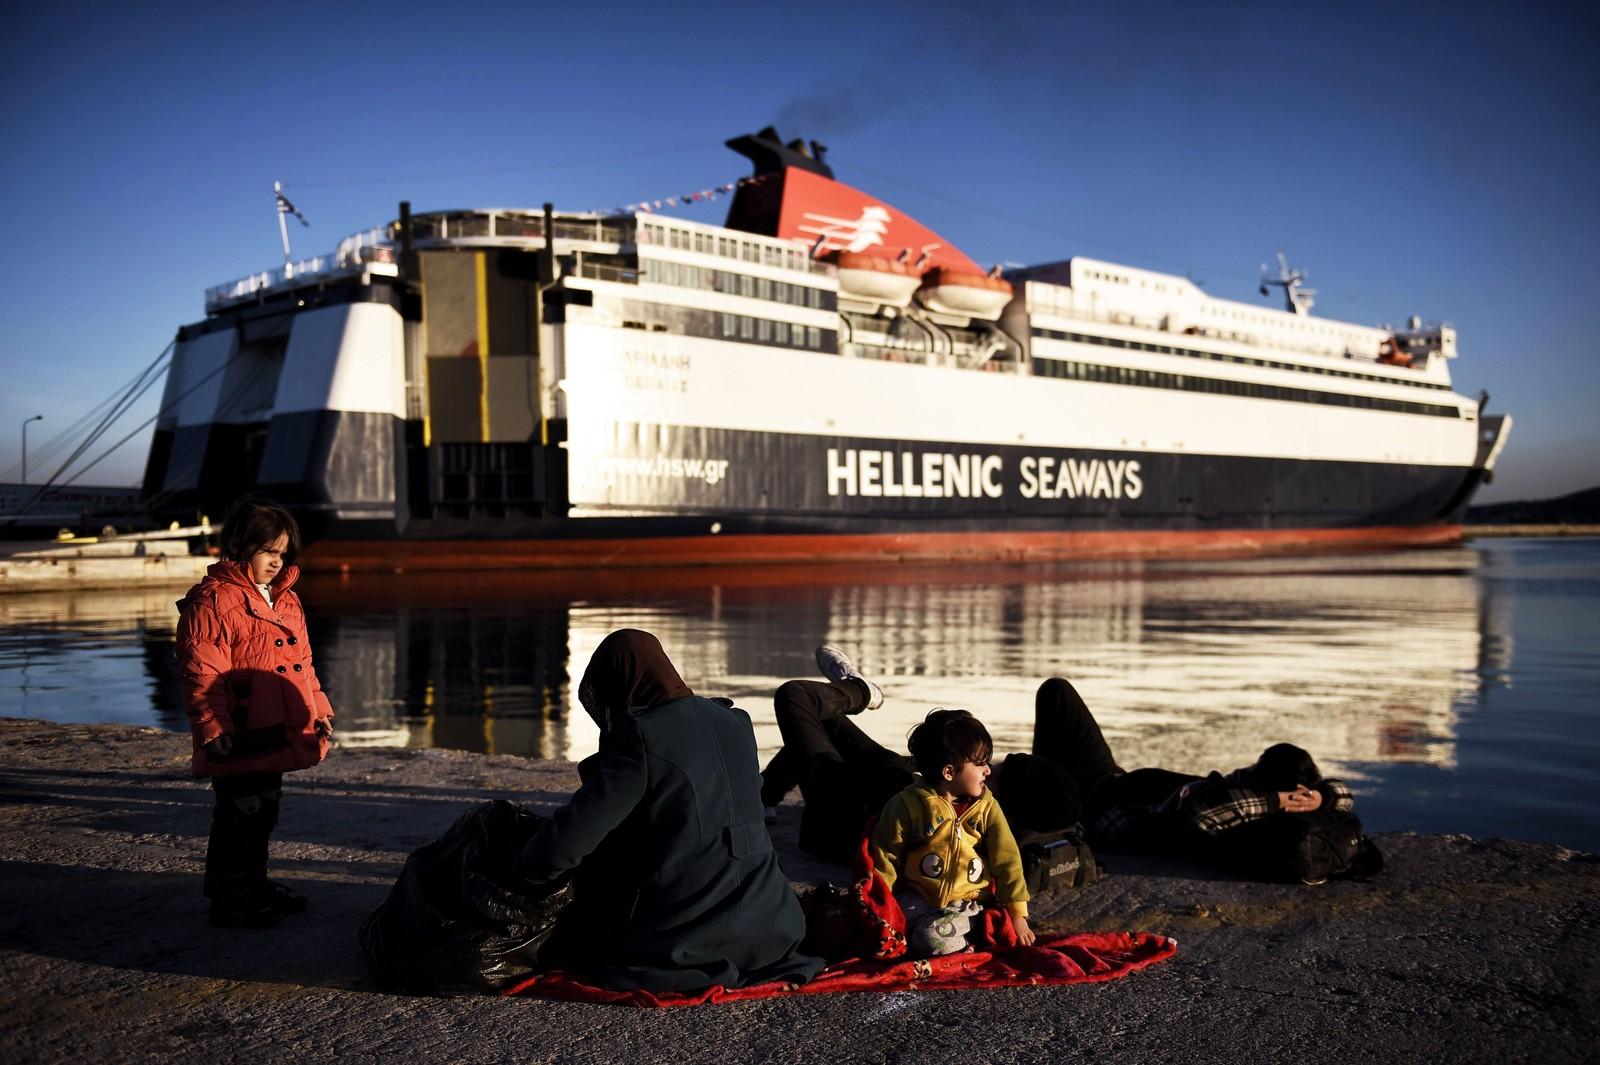 En familie syriske flyktninger på stranden ved havnen på Lesvos 6. desember 2015 mens de venter på båten videre til det greske fastlandet.